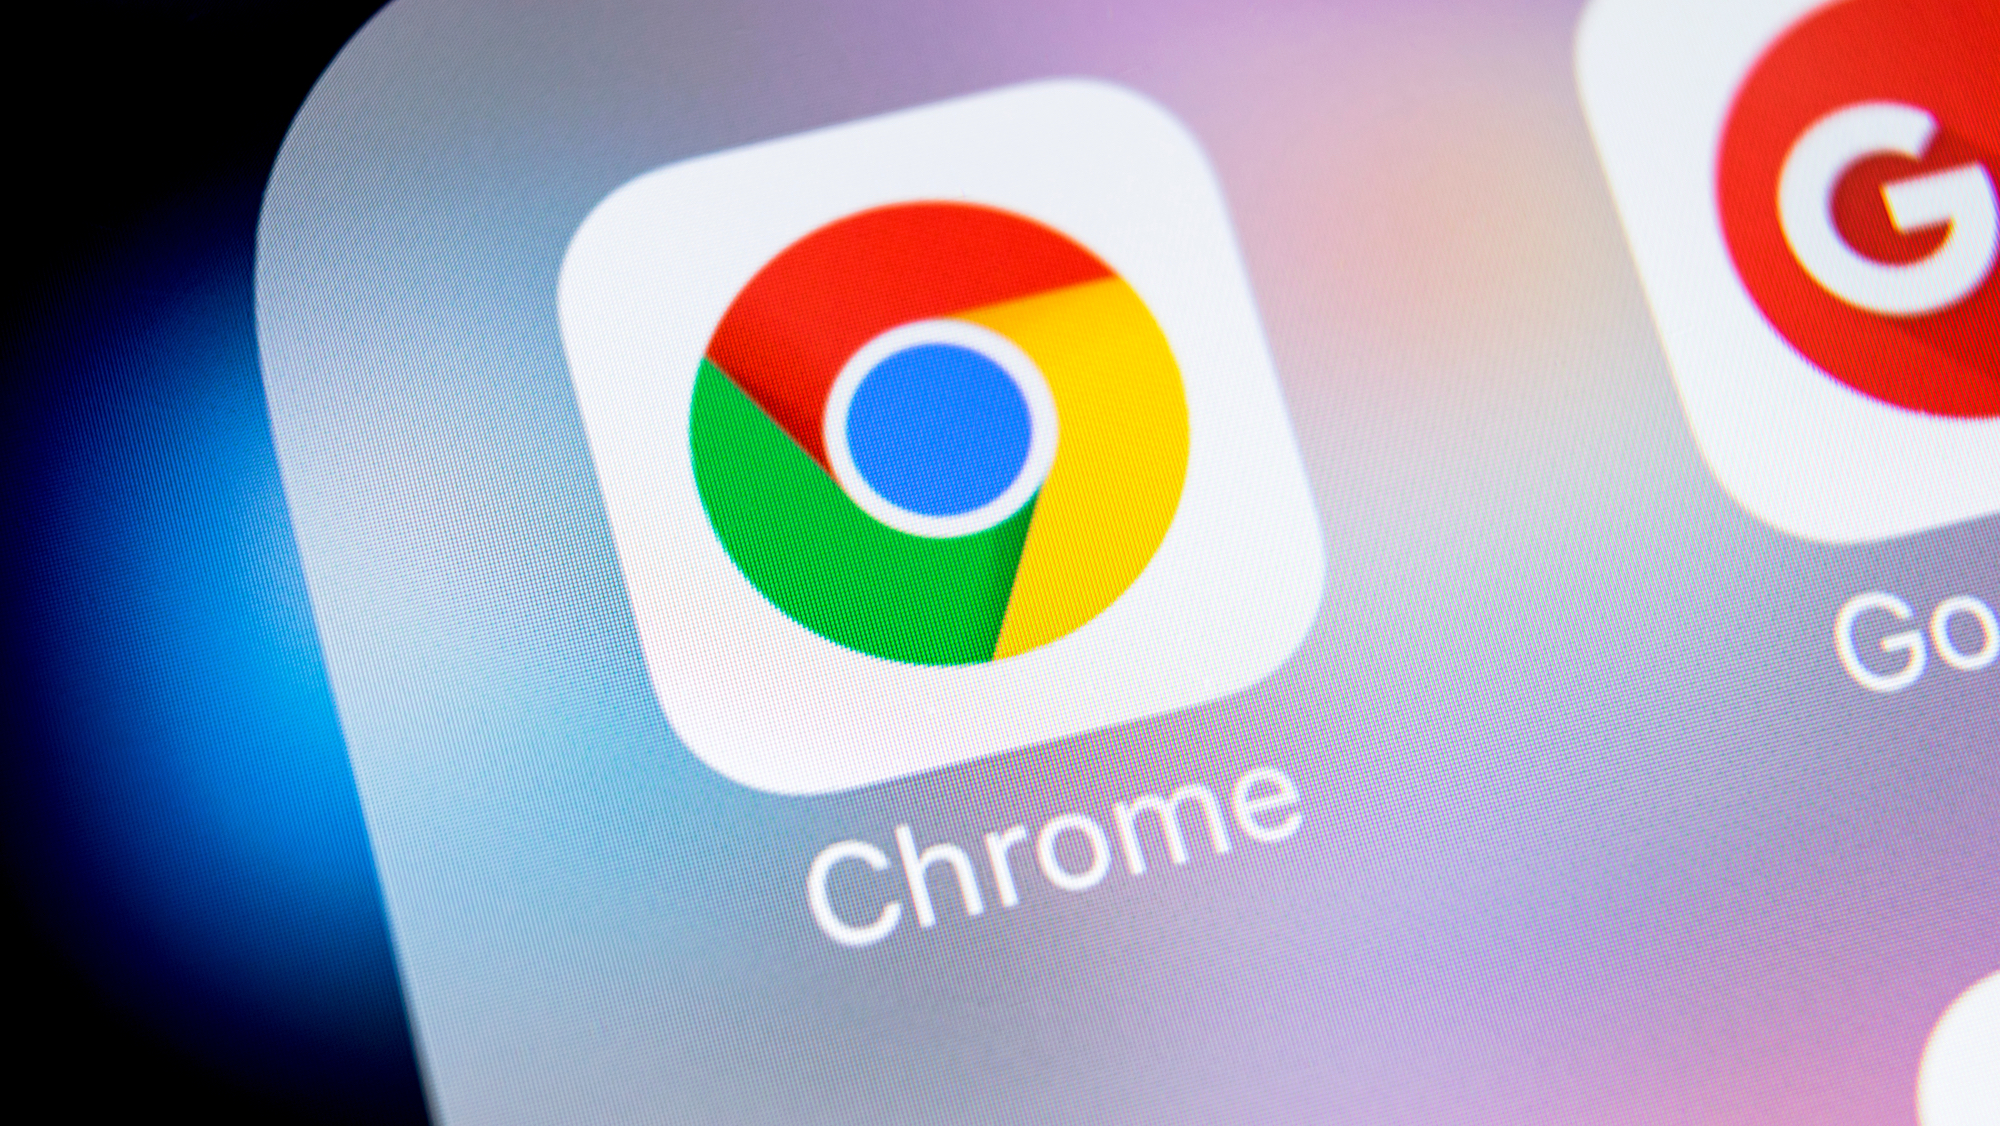 Update Google Chrome Immediately!